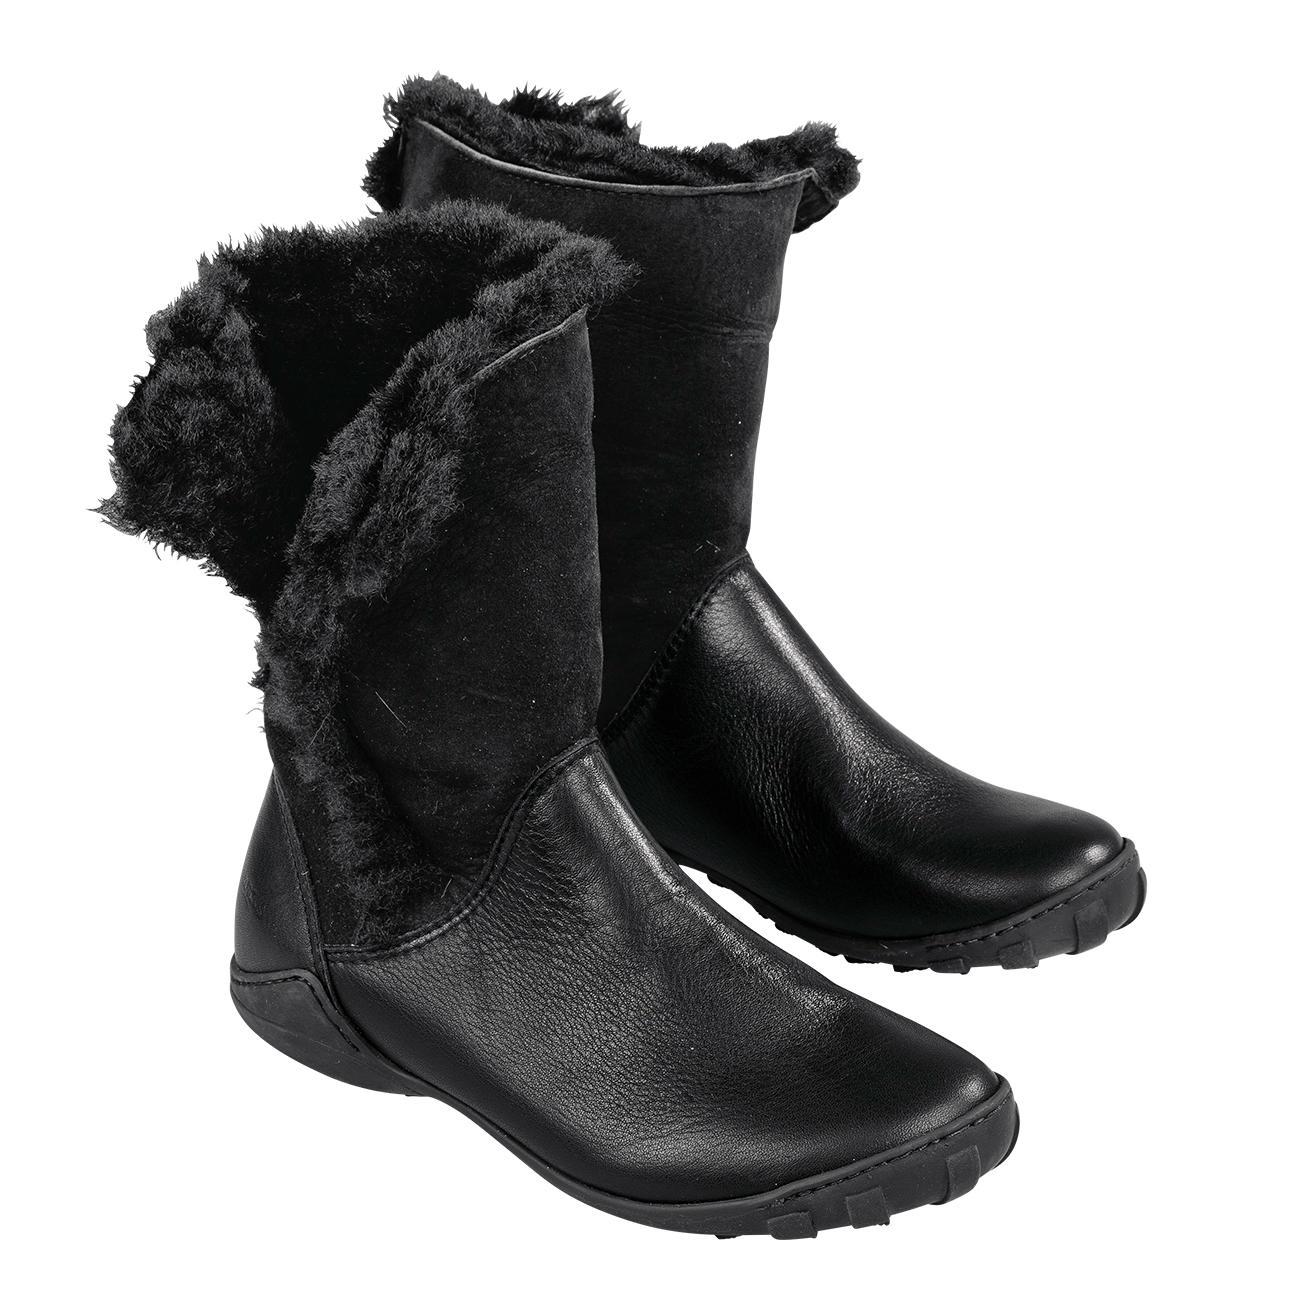 Arcus Lammfell Stulpen Stiefel | Klassiker entdecken